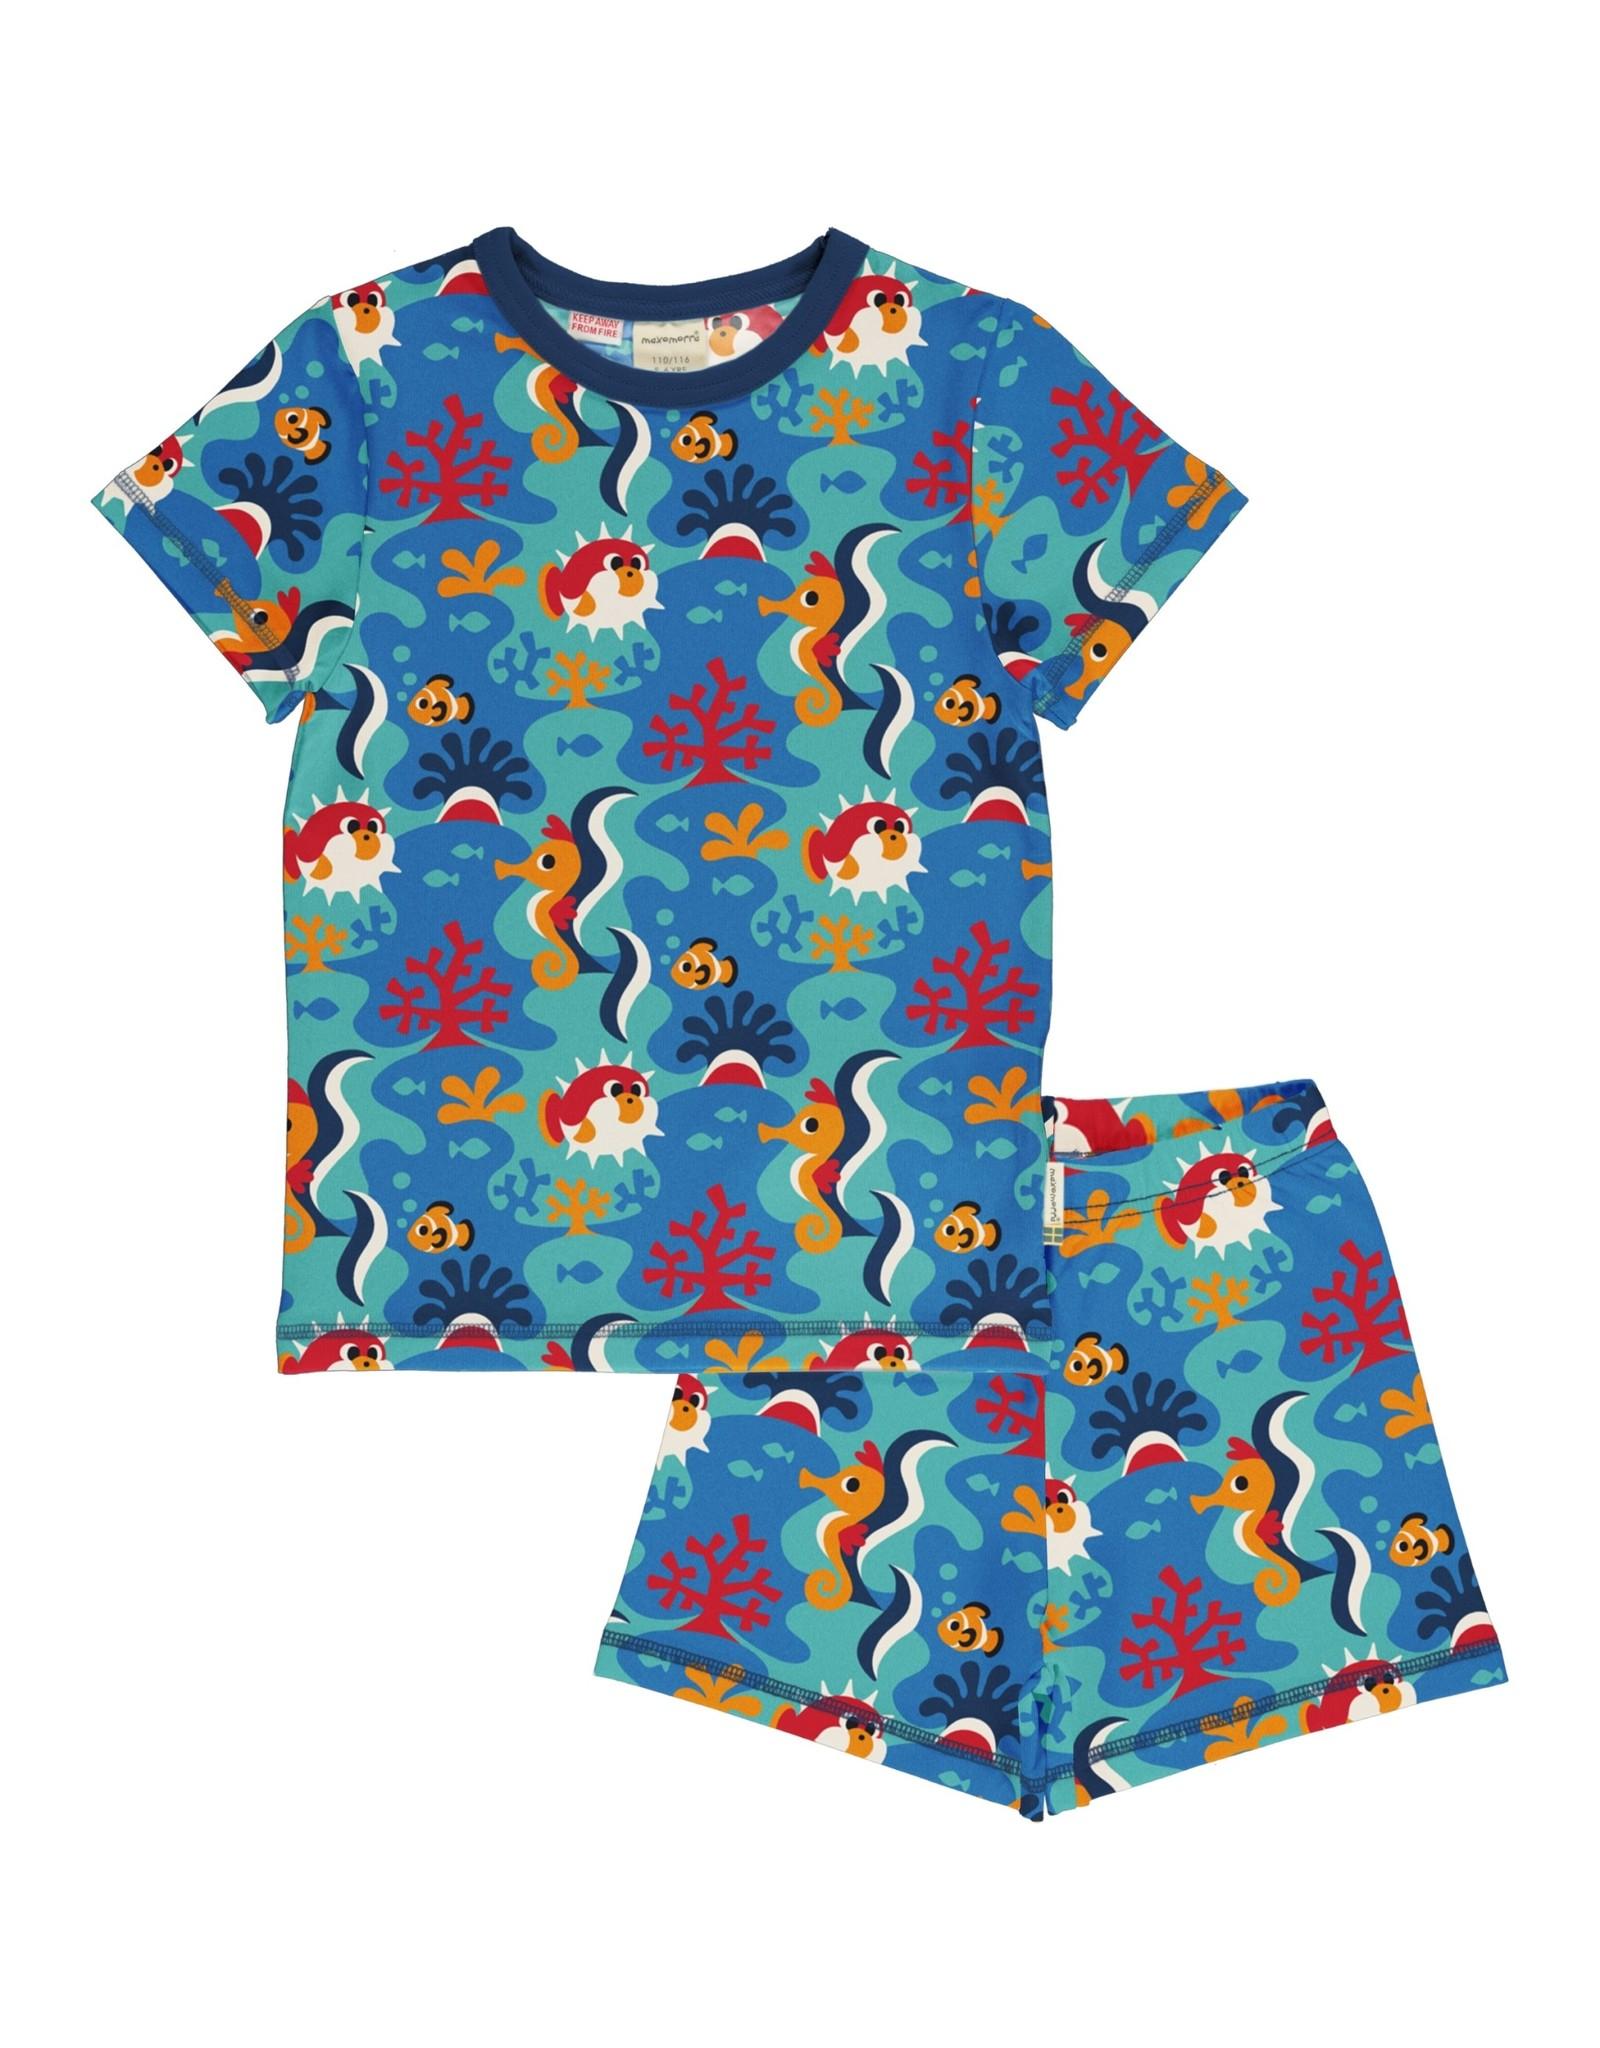 Maxomorra Zomer pyjama met koraalrif print